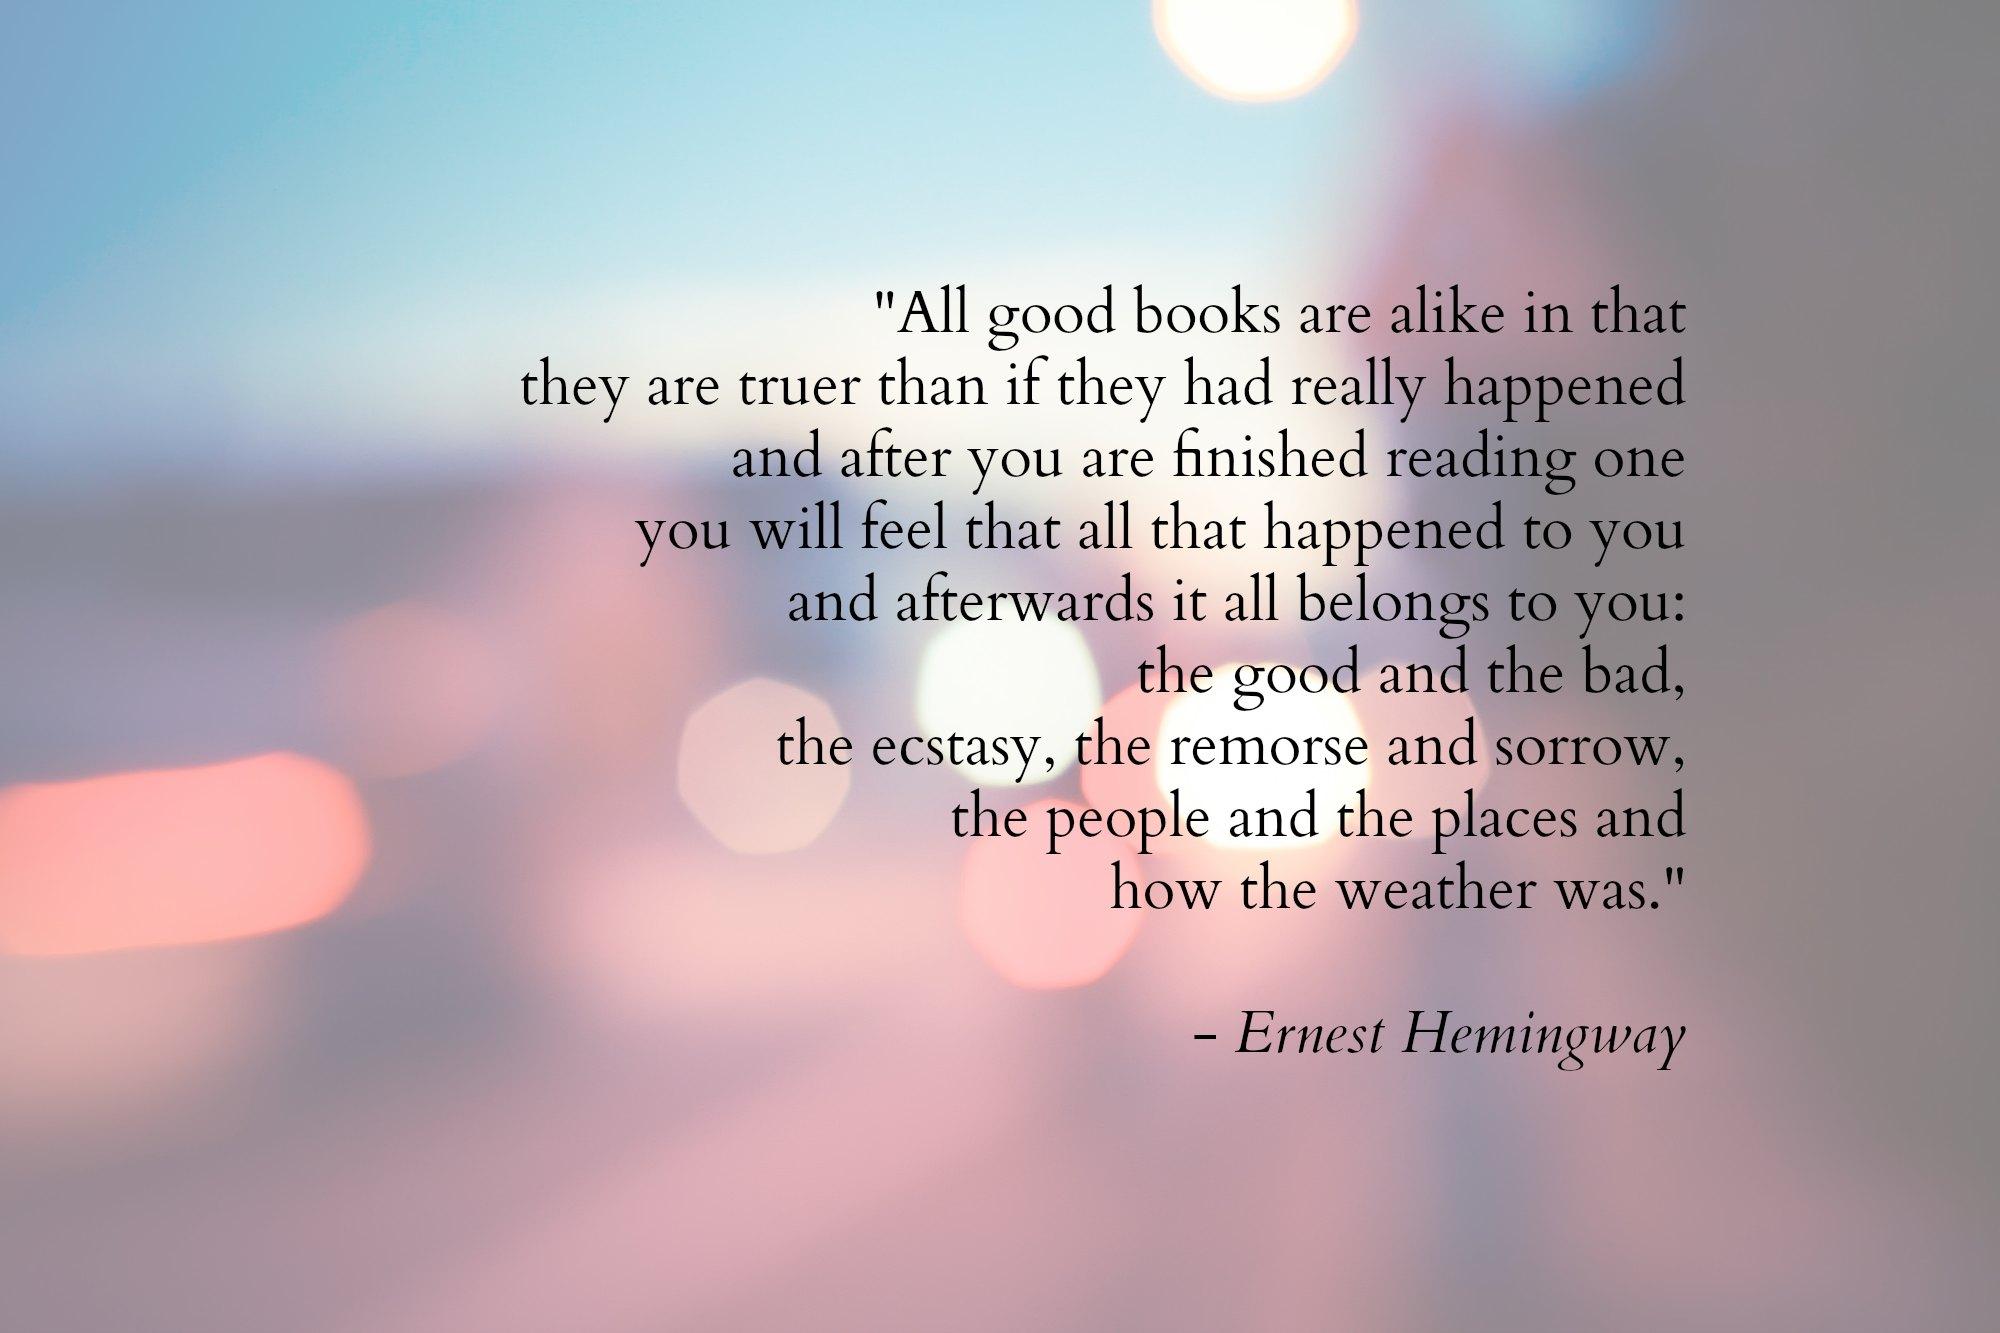 Image: Ernest Hemingway Quote